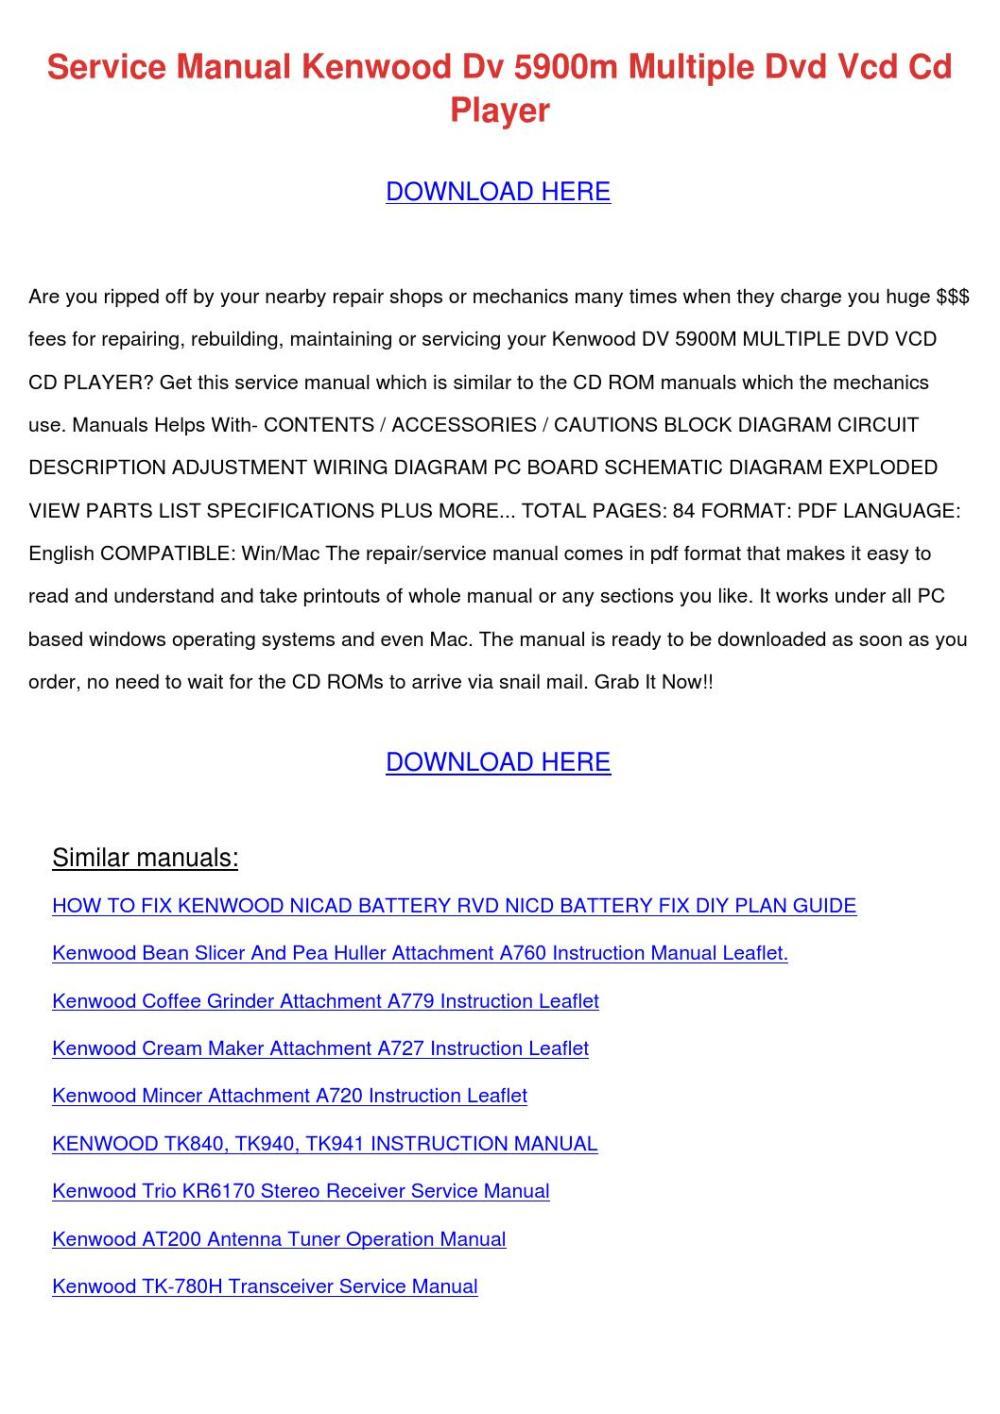 medium resolution of service manual kenwood dv 5900m multiple dvd